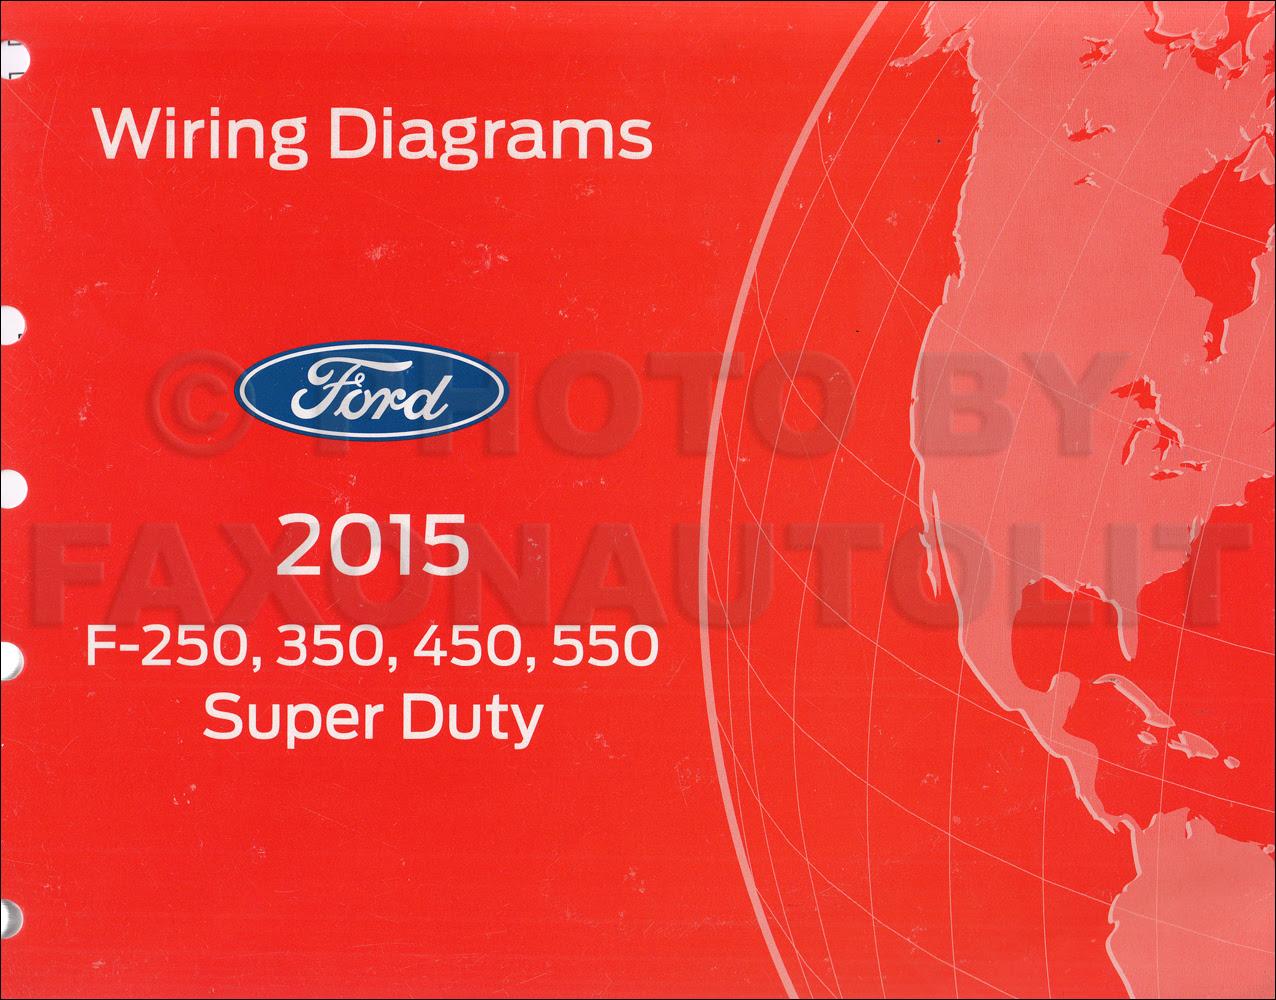 Ford 1900 Wiring Diagram